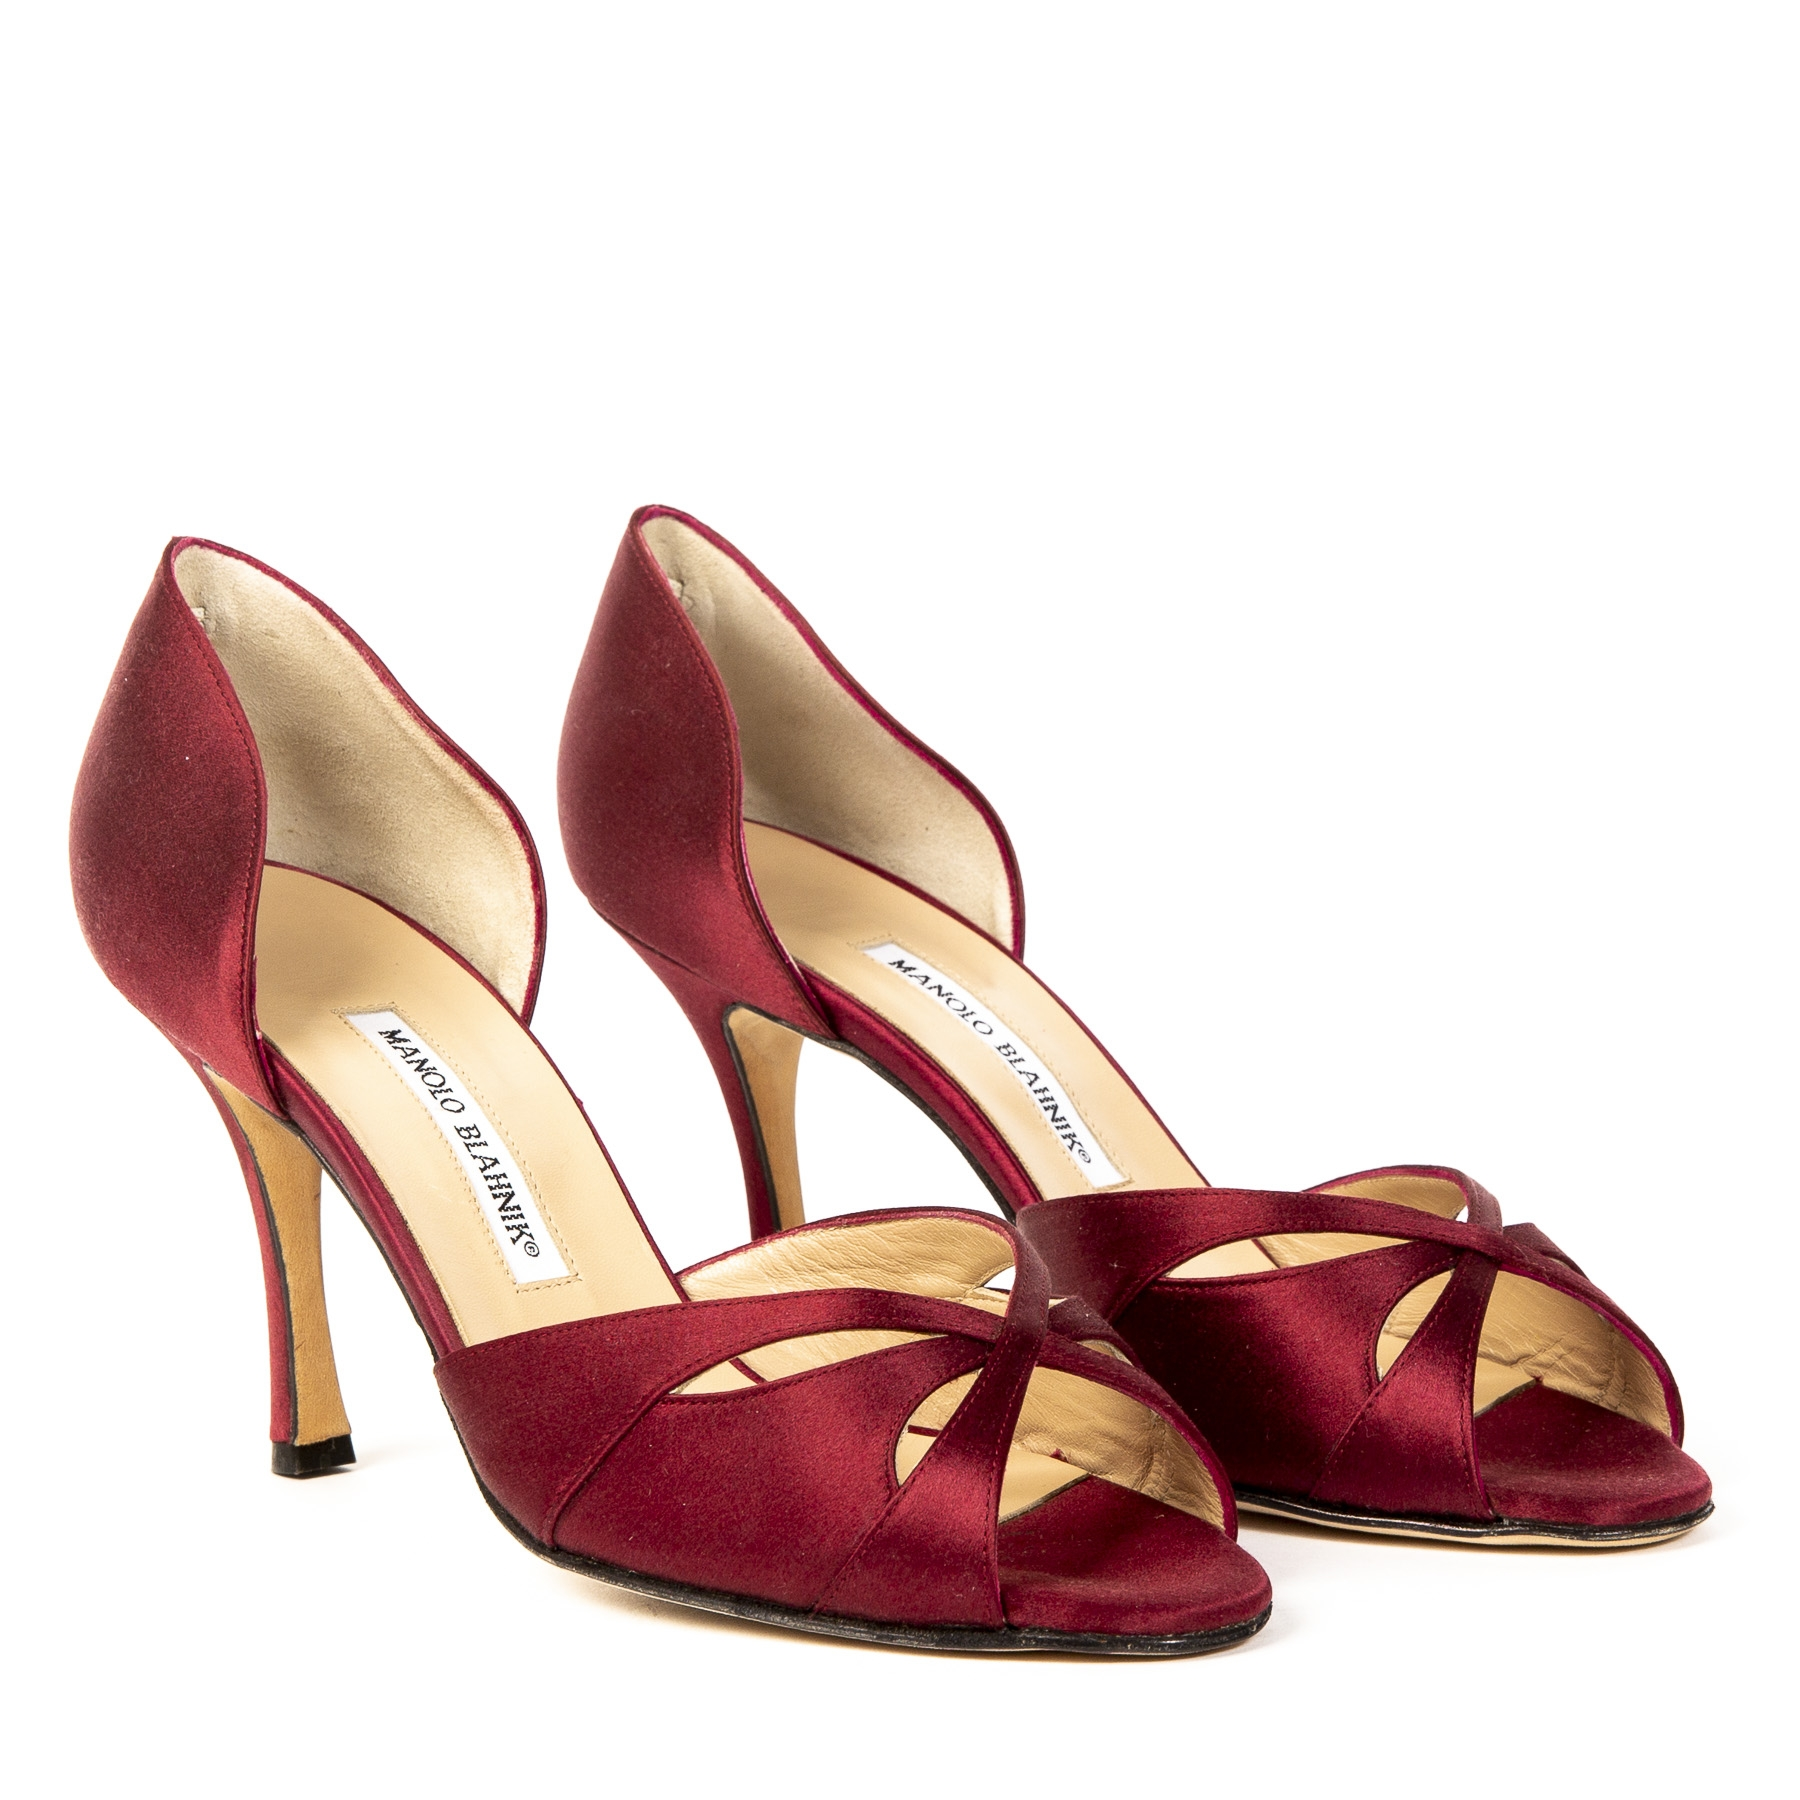 a6550f4030b4d ... Authentieke Tweedehands Manolo Blahnik Bordeaux Satin Butterflop Peep  Toe Heels juiste prijs veilig online shoppen luxe